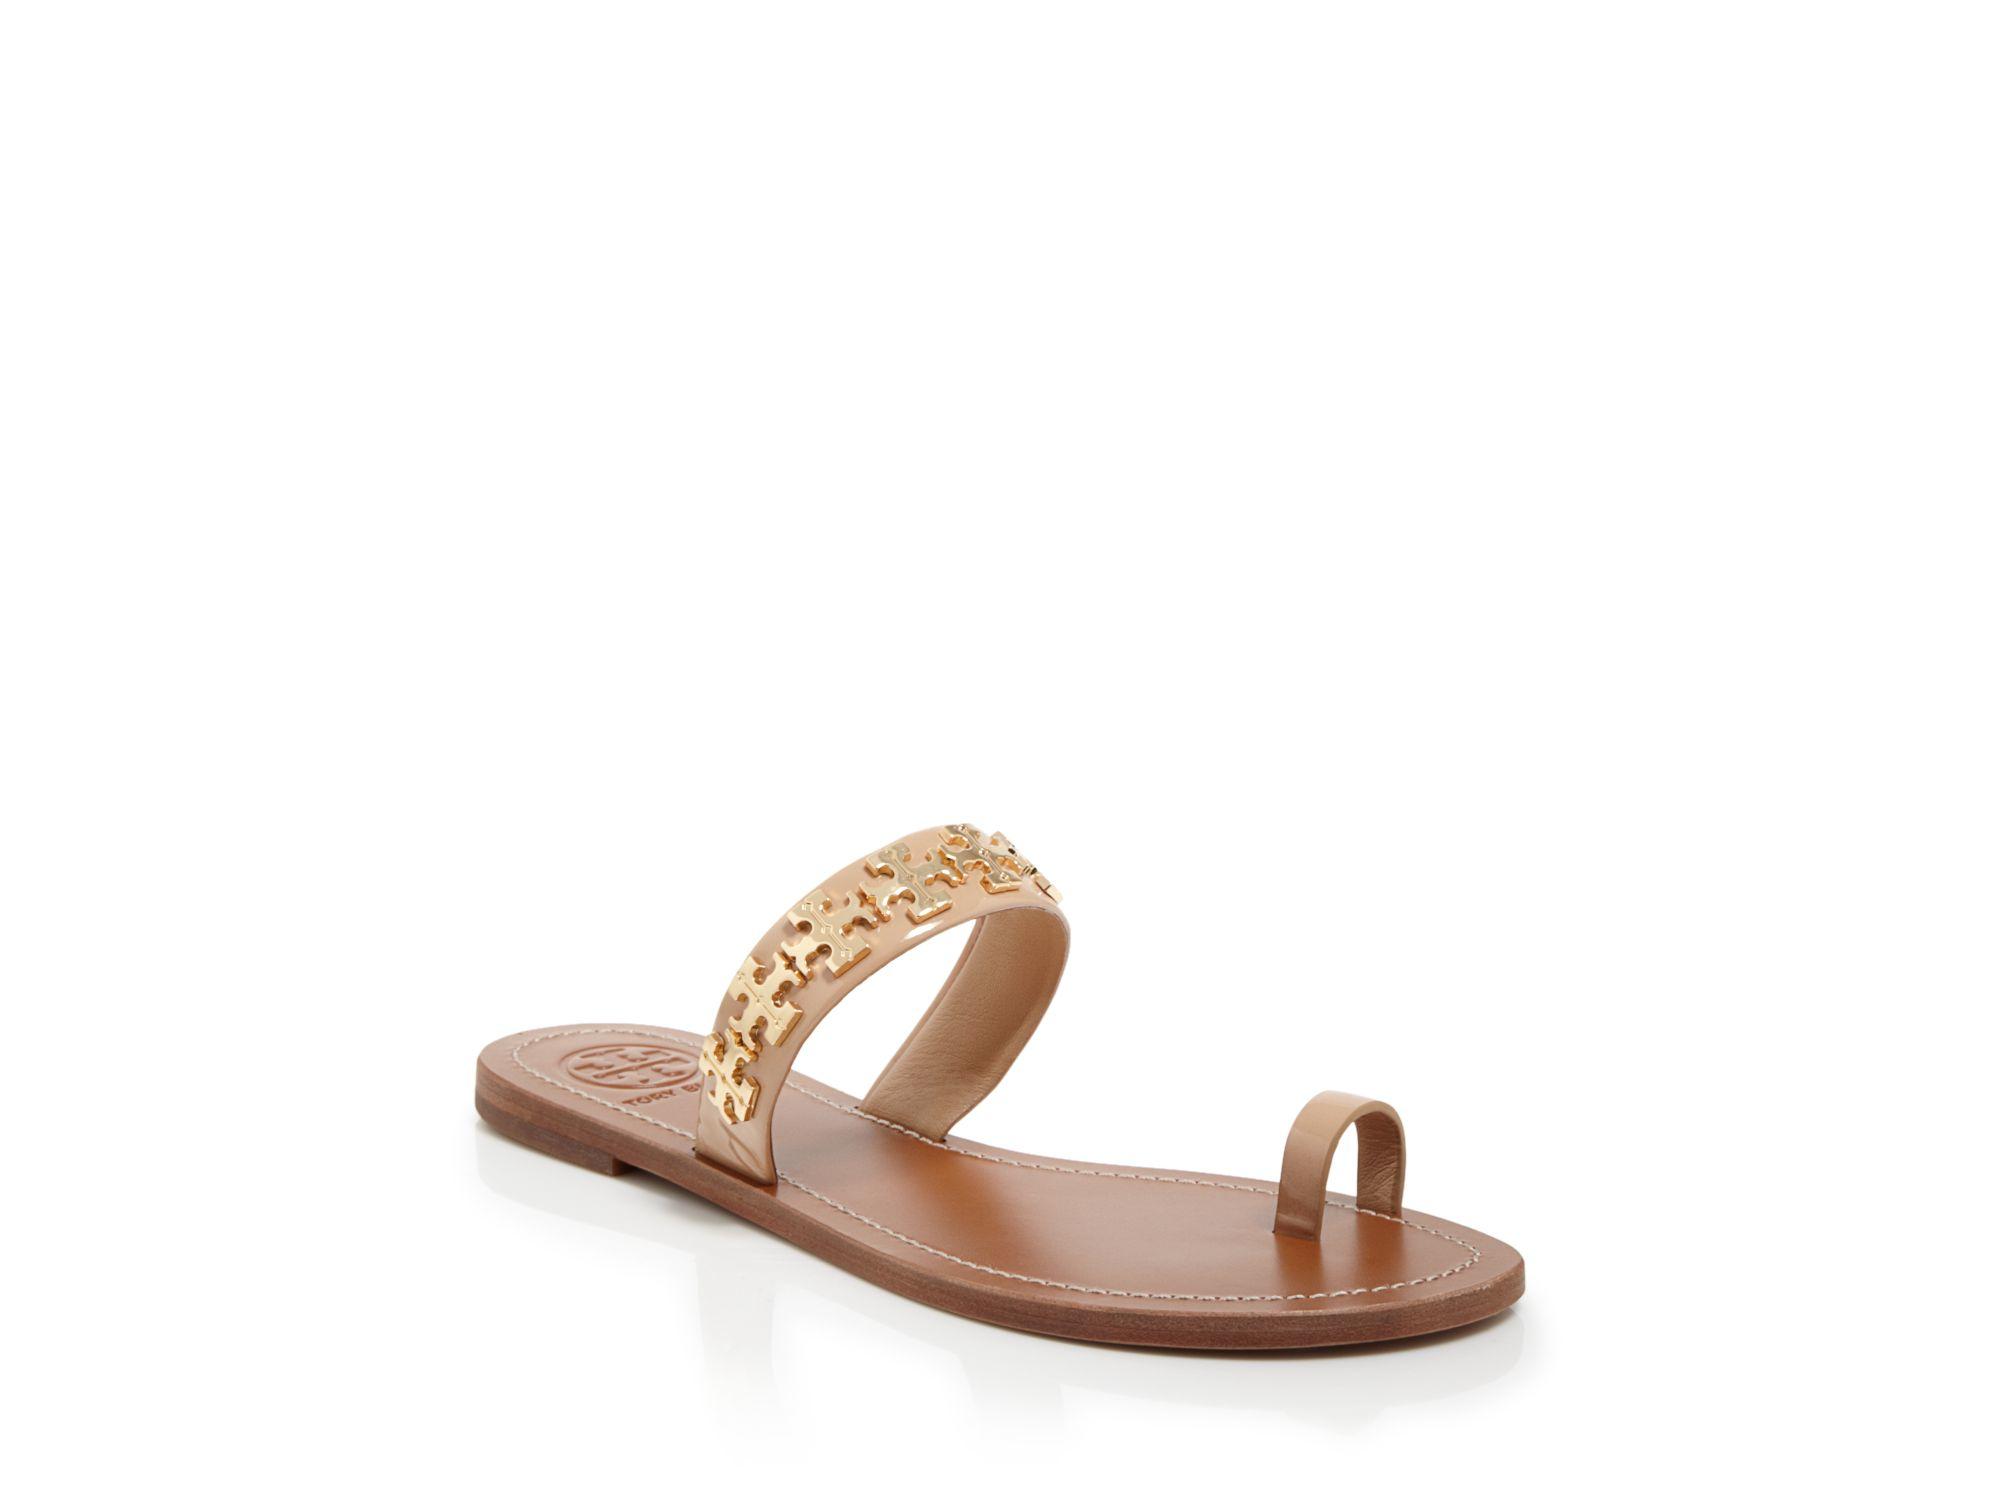 936fb6f0c599 Lyst - Tory Burch Logo Toe Ring Flat Sandals - Val in Pink